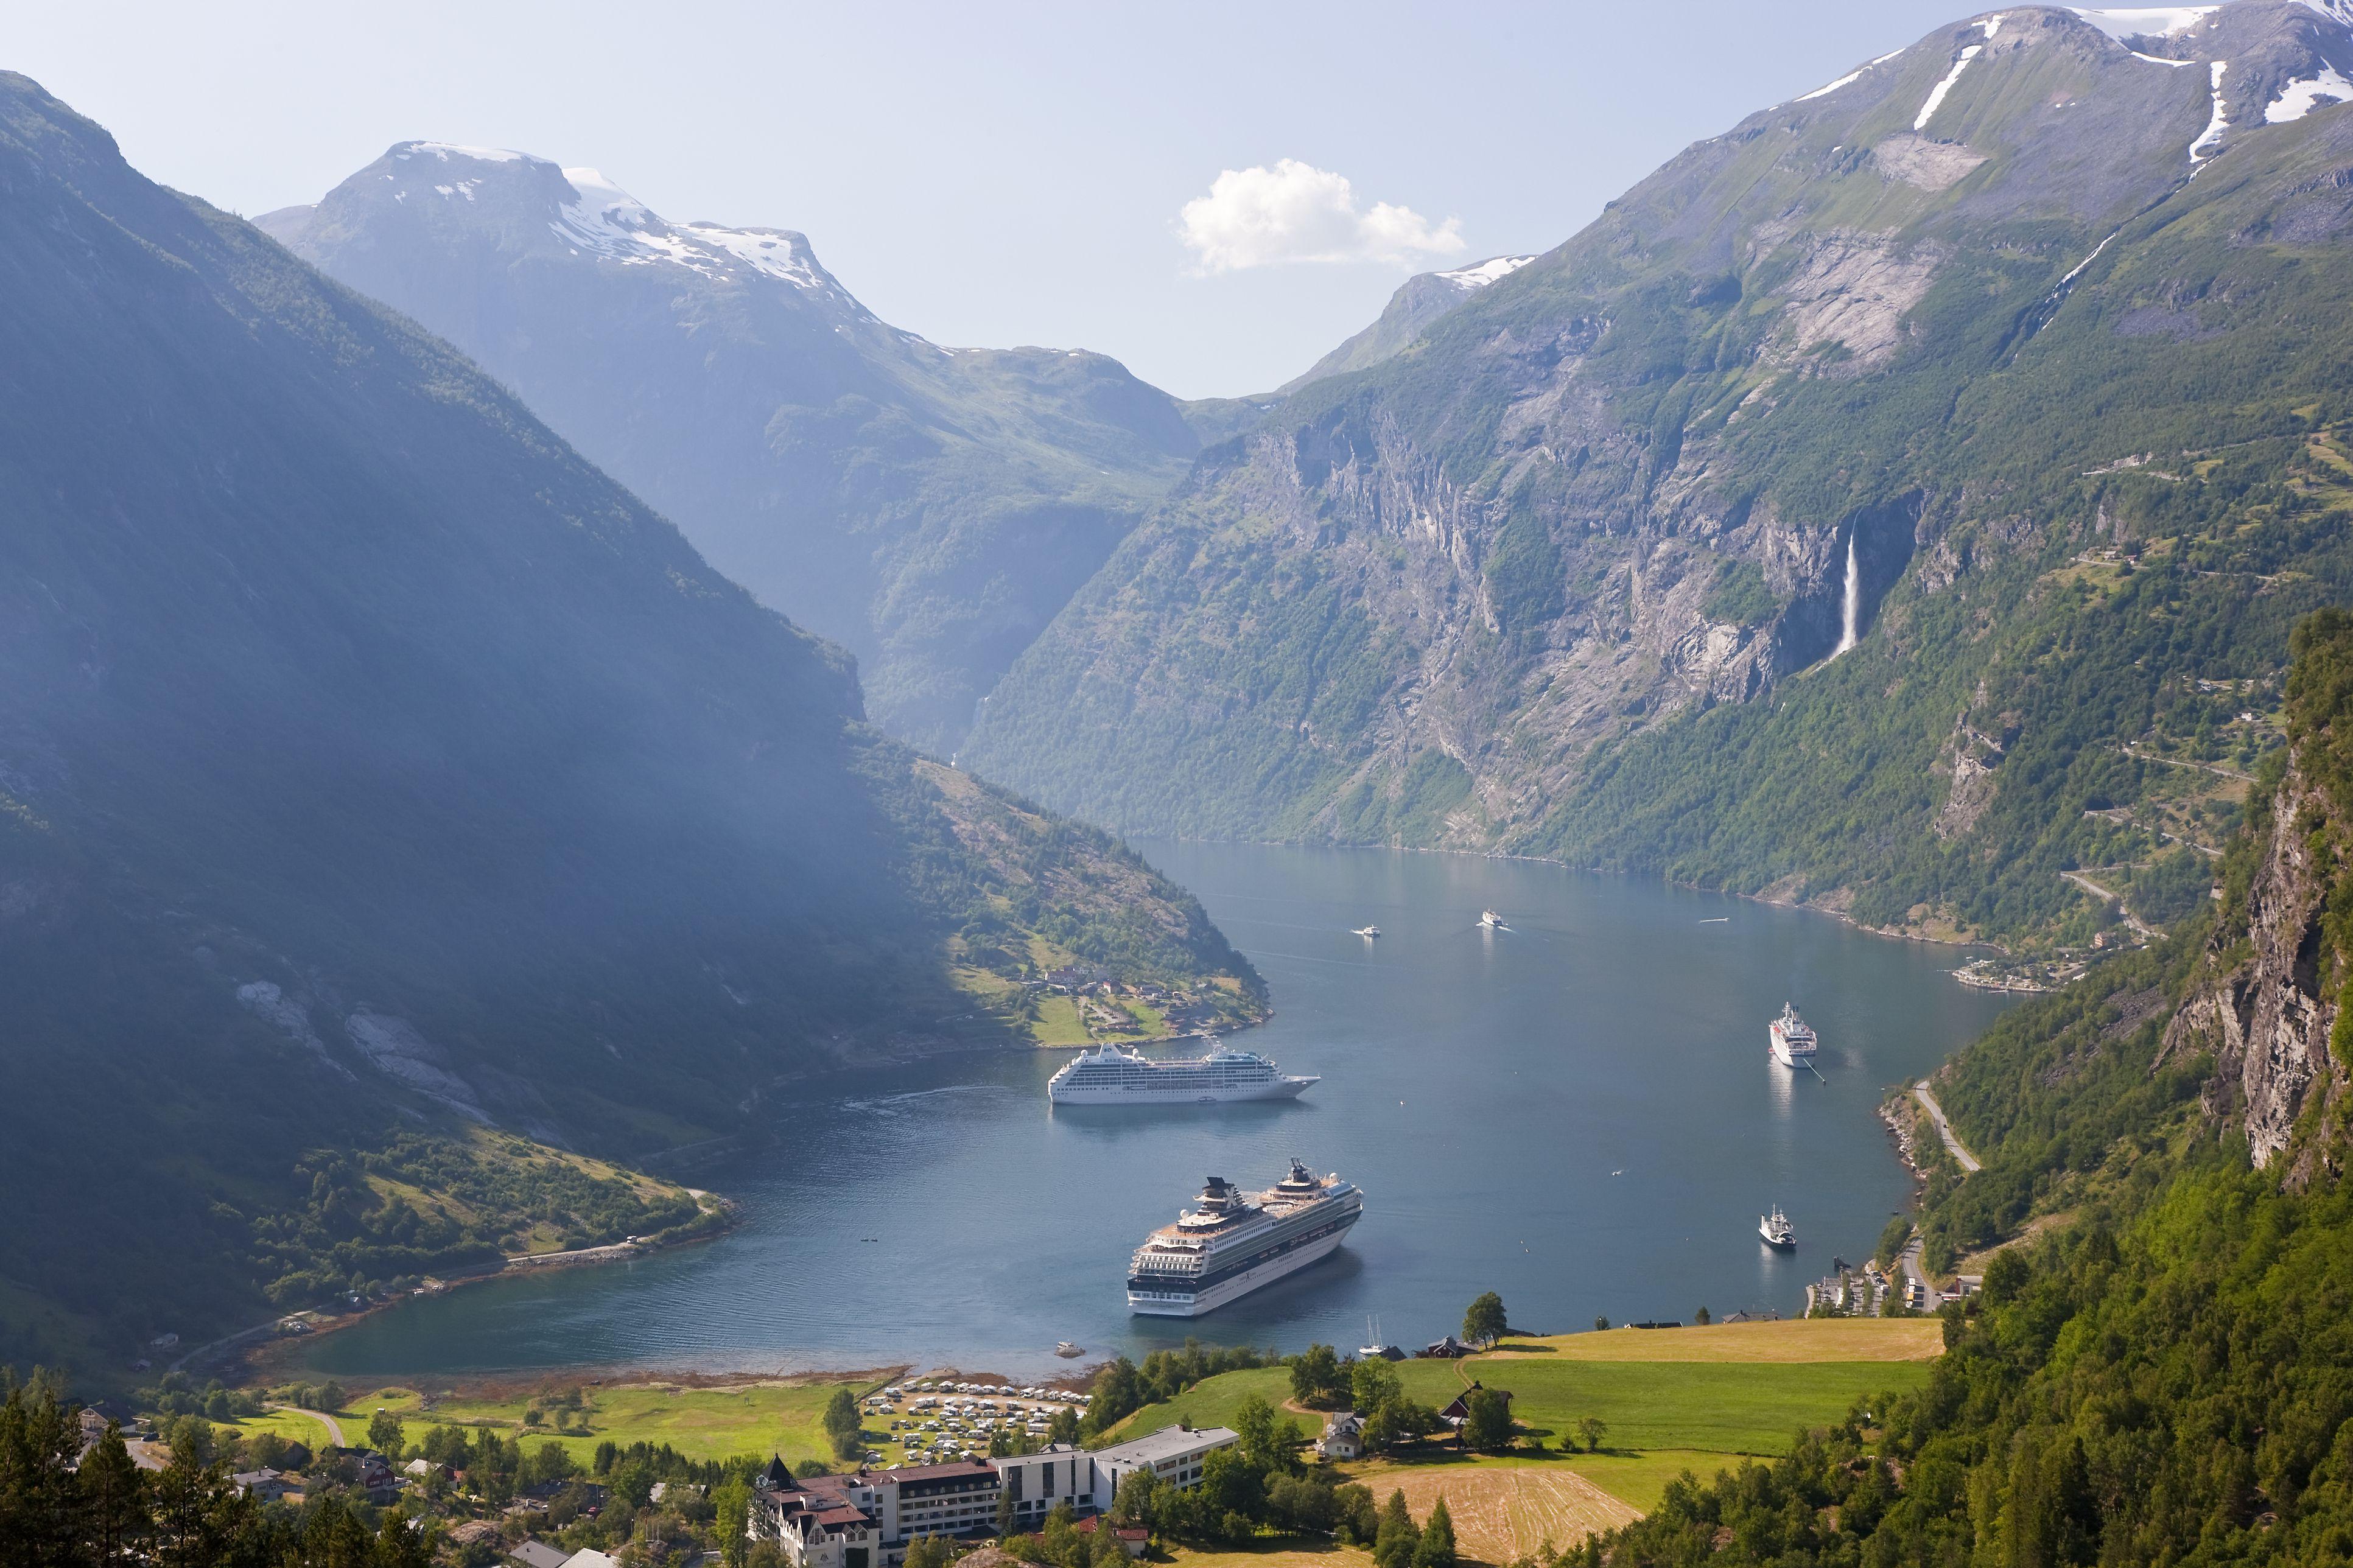 Cruise ships, Geirangerfjord, Norway